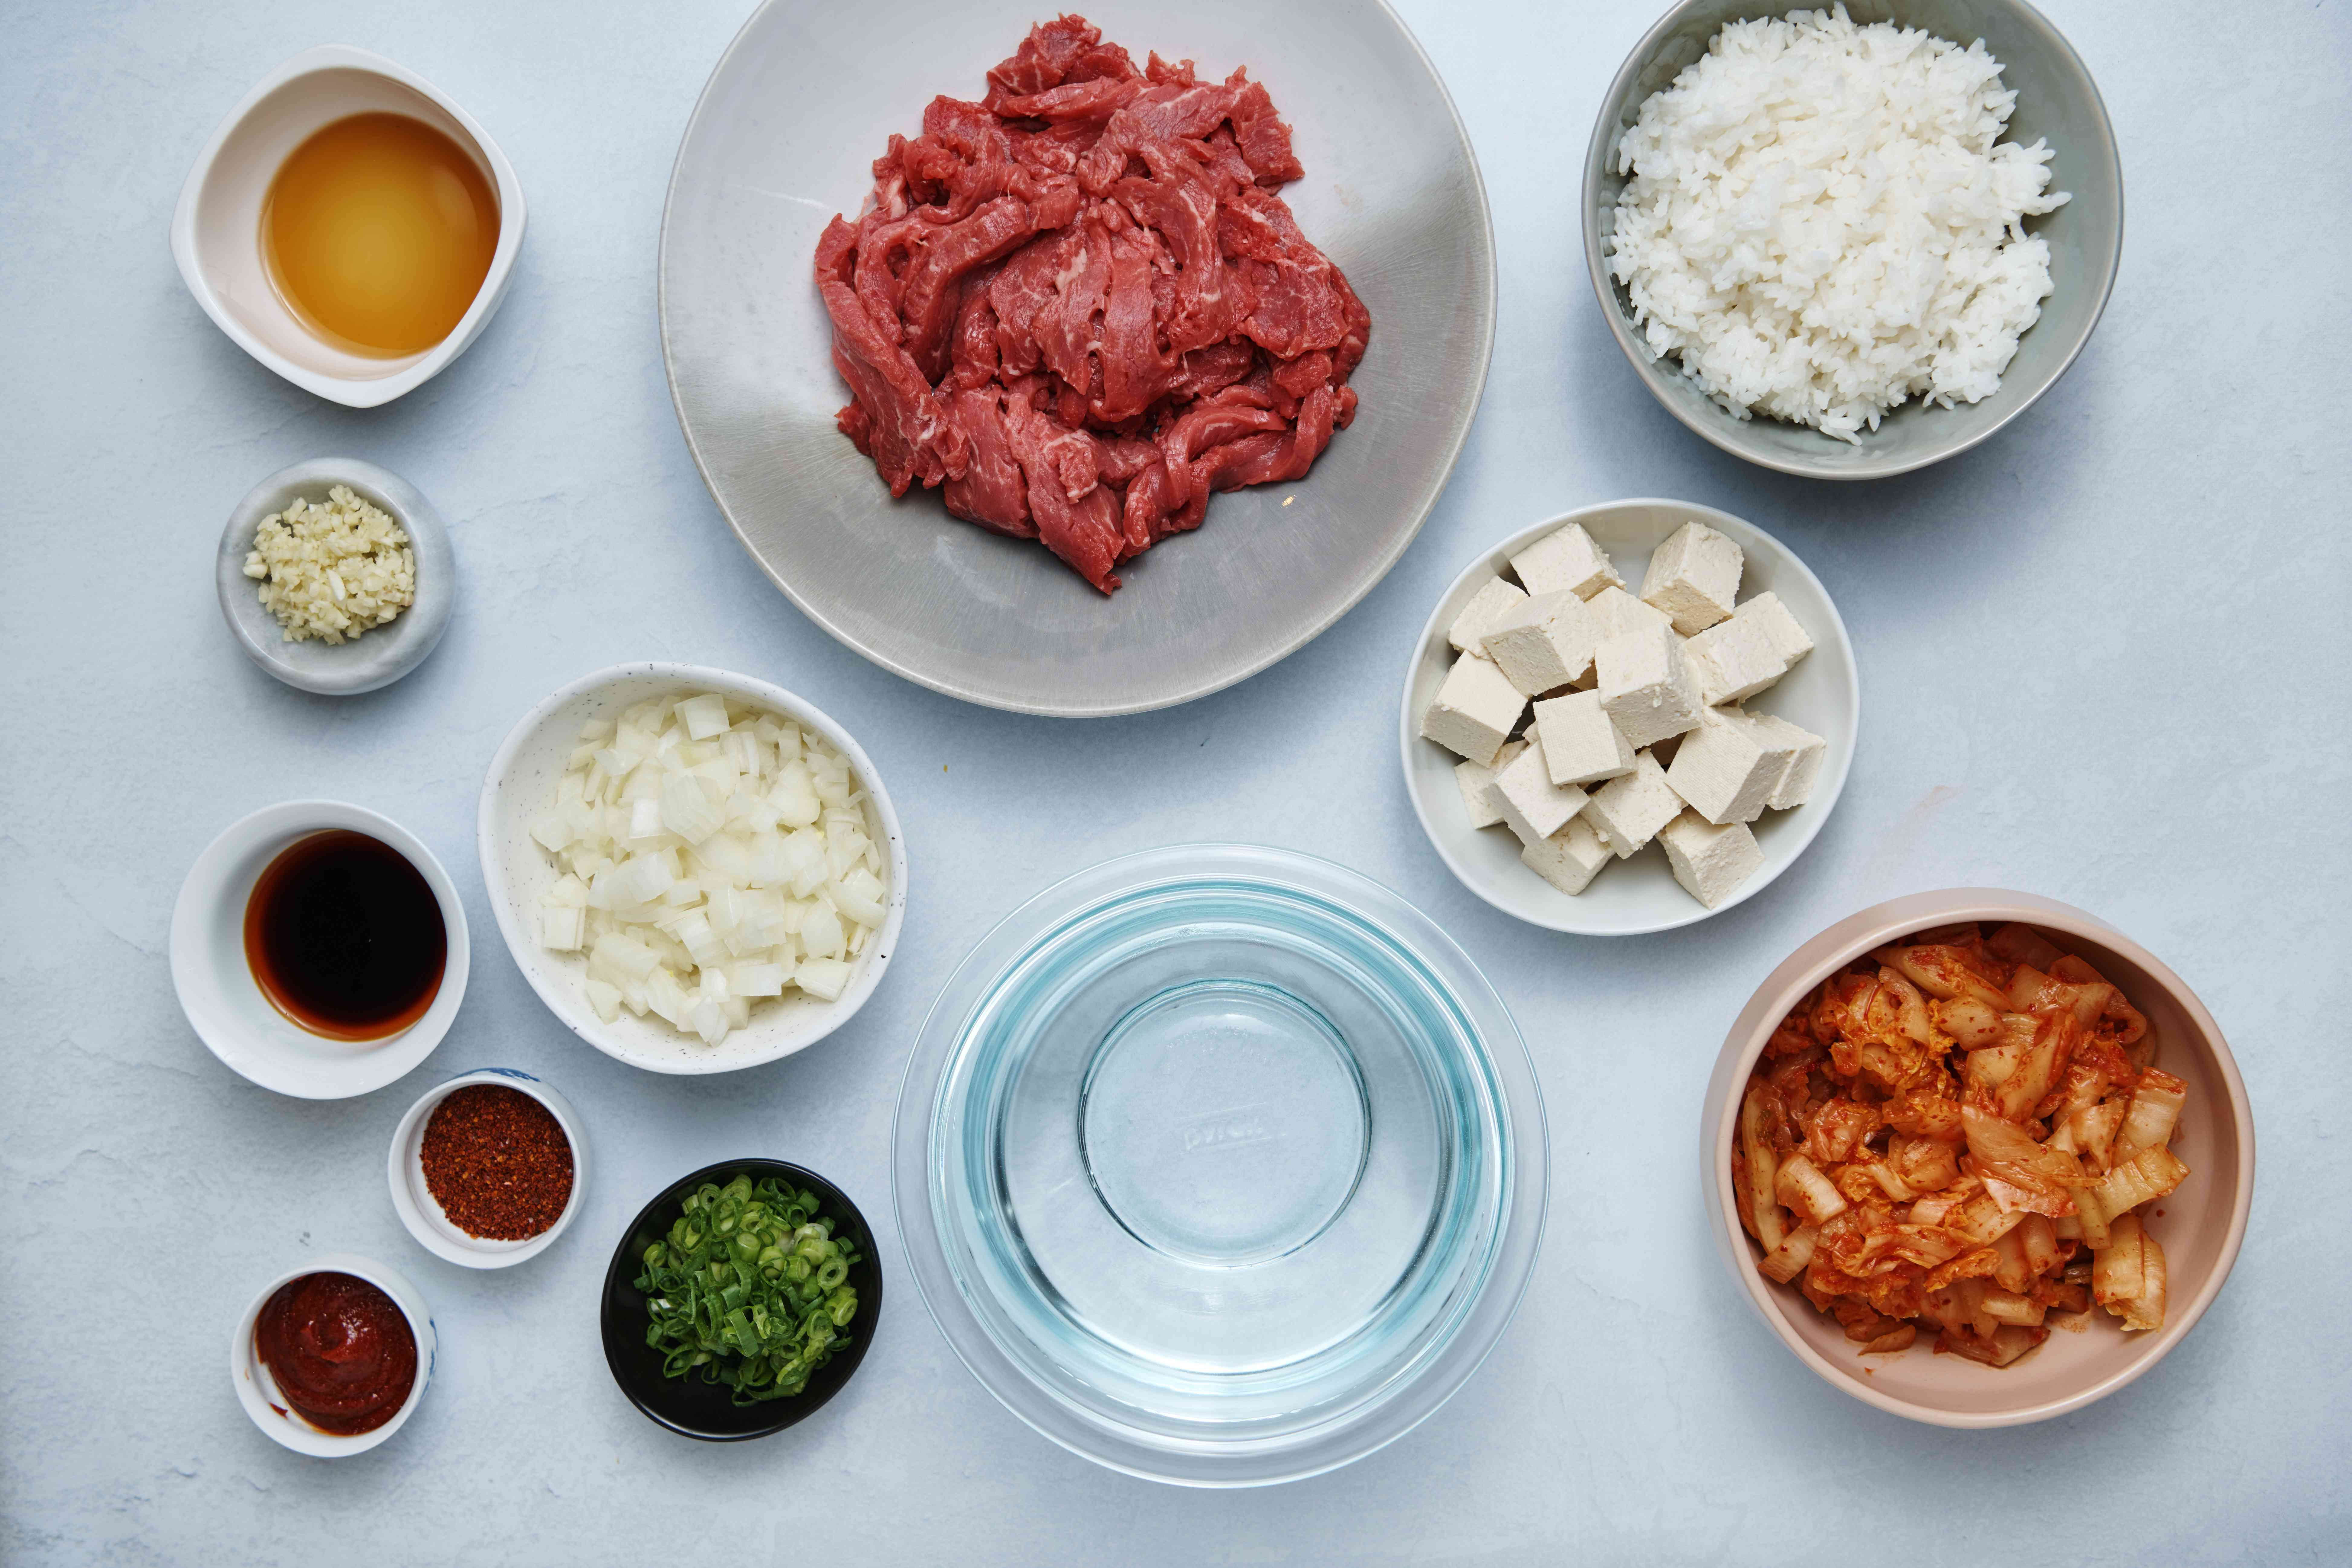 Ingredients for kimchi stew